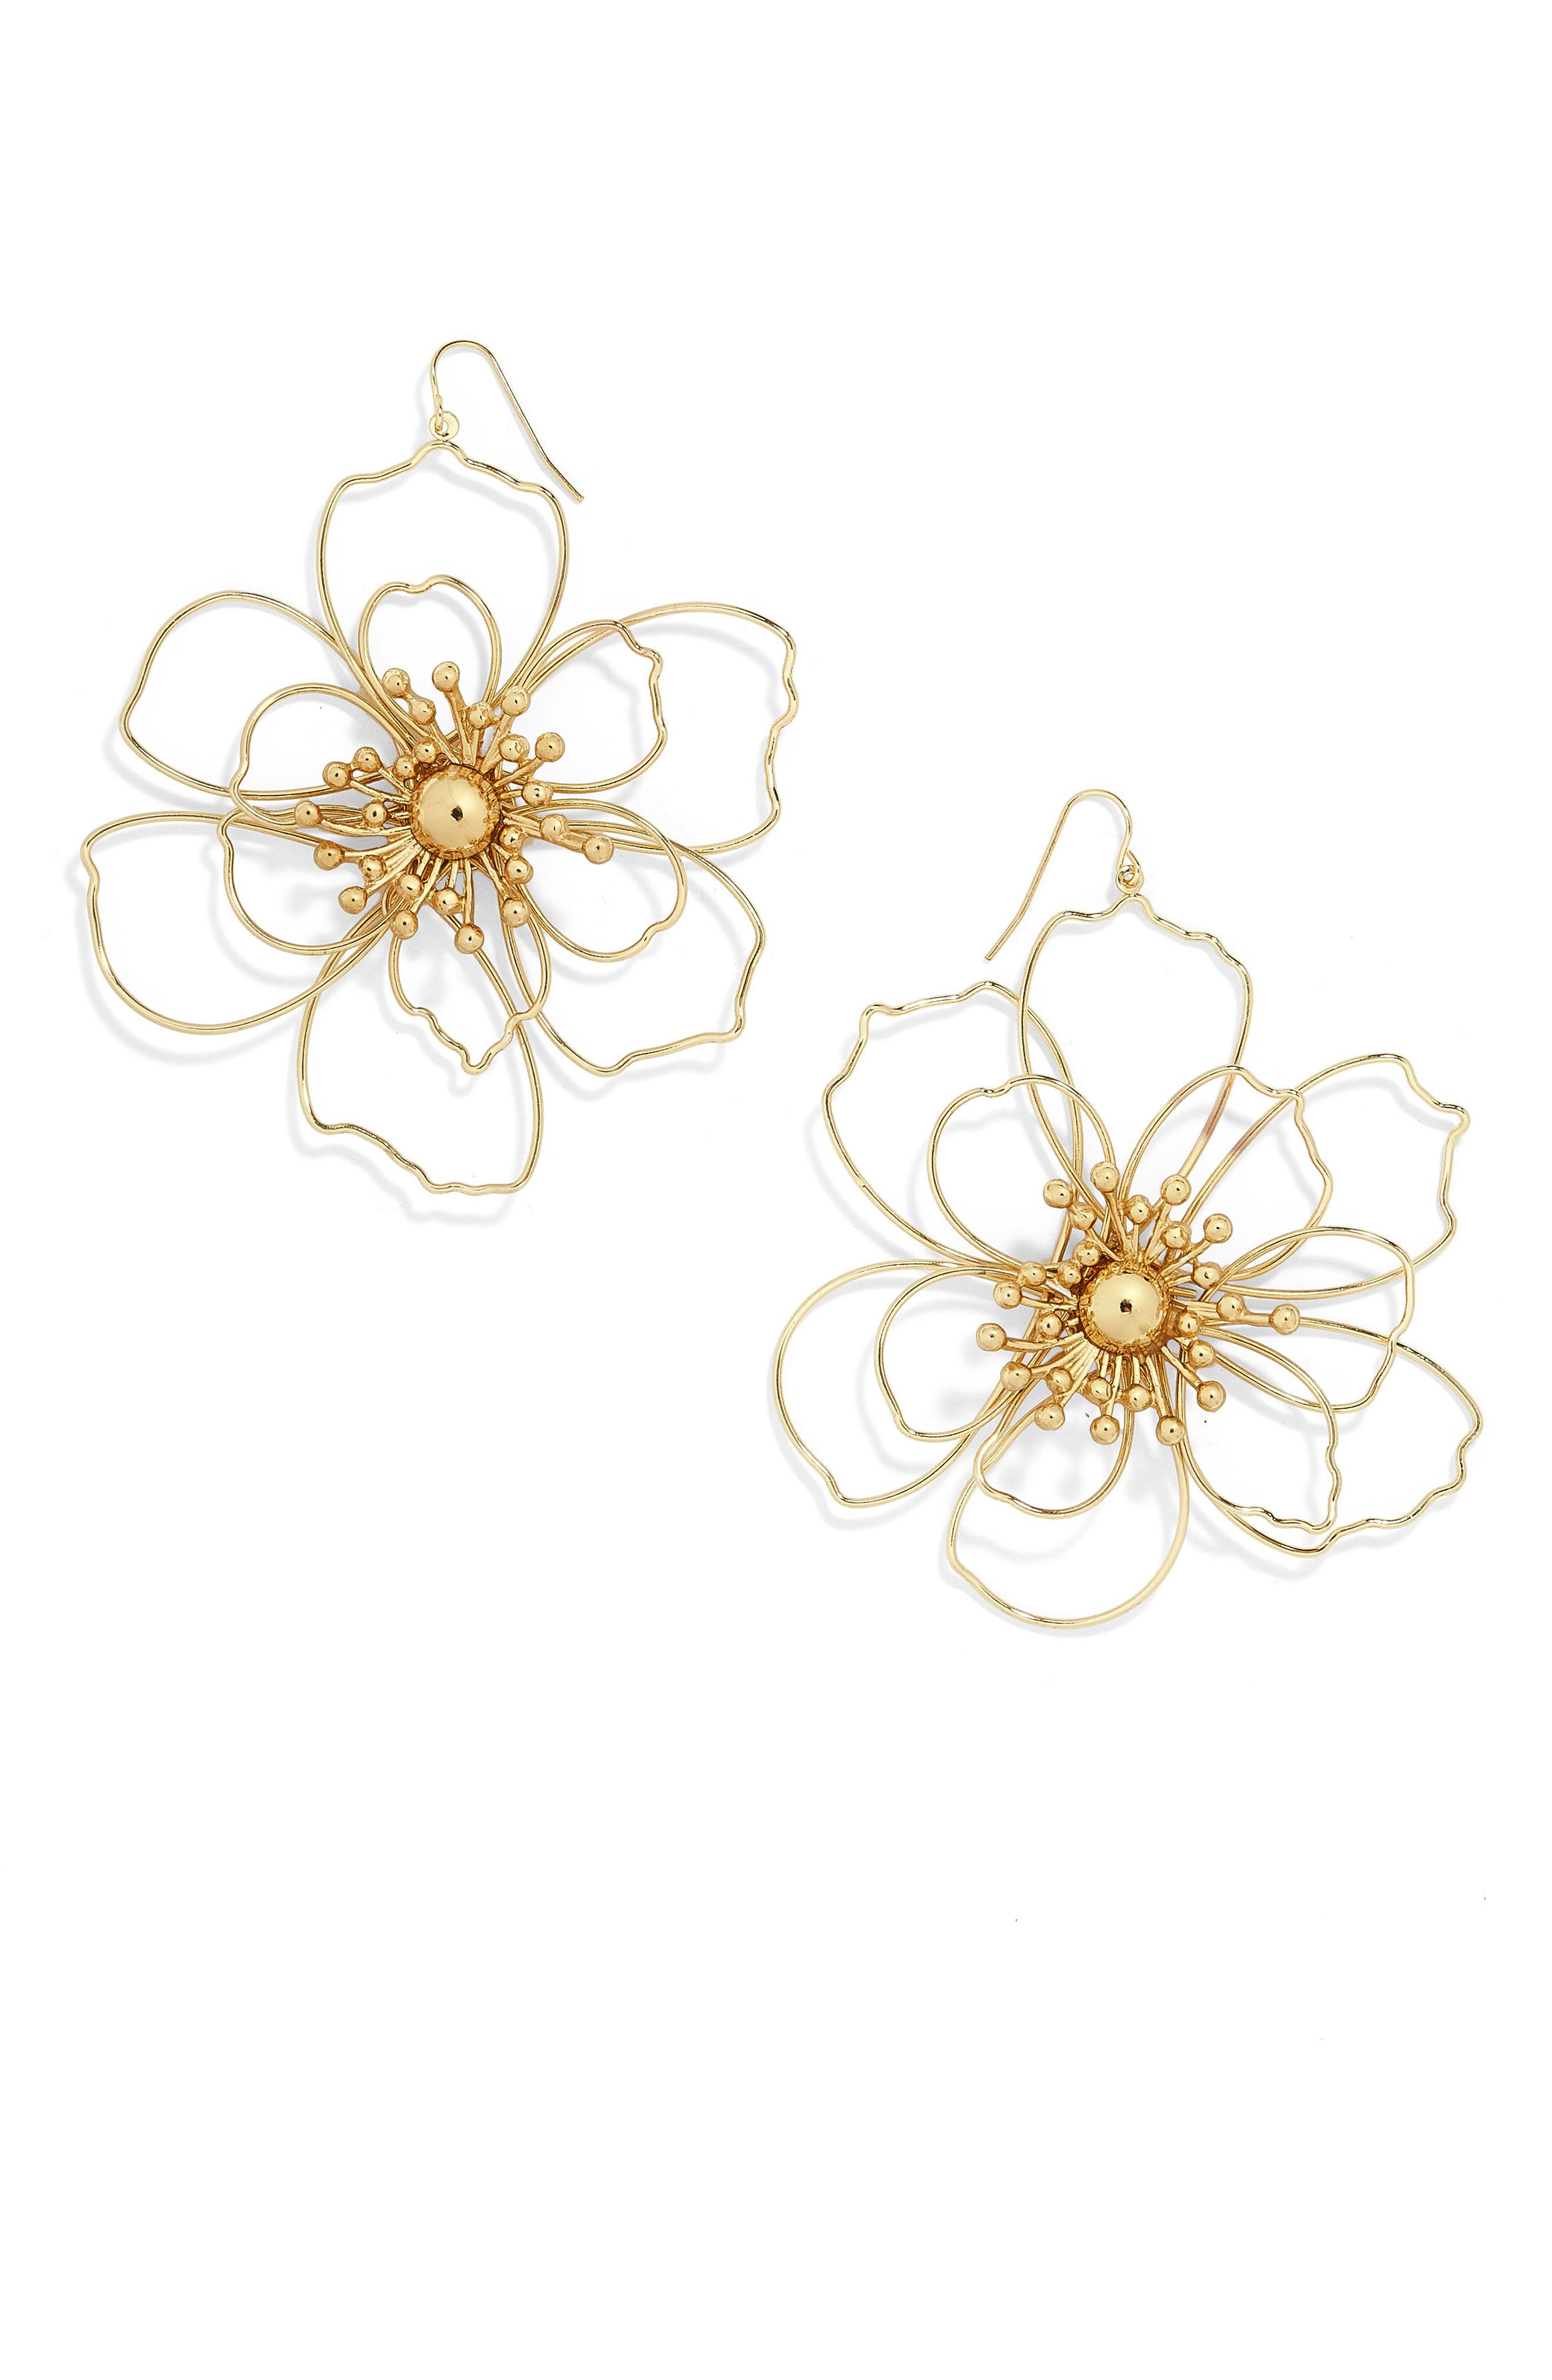 Blossom Drop Earrings,                             Main thumbnail 1, color,                             710